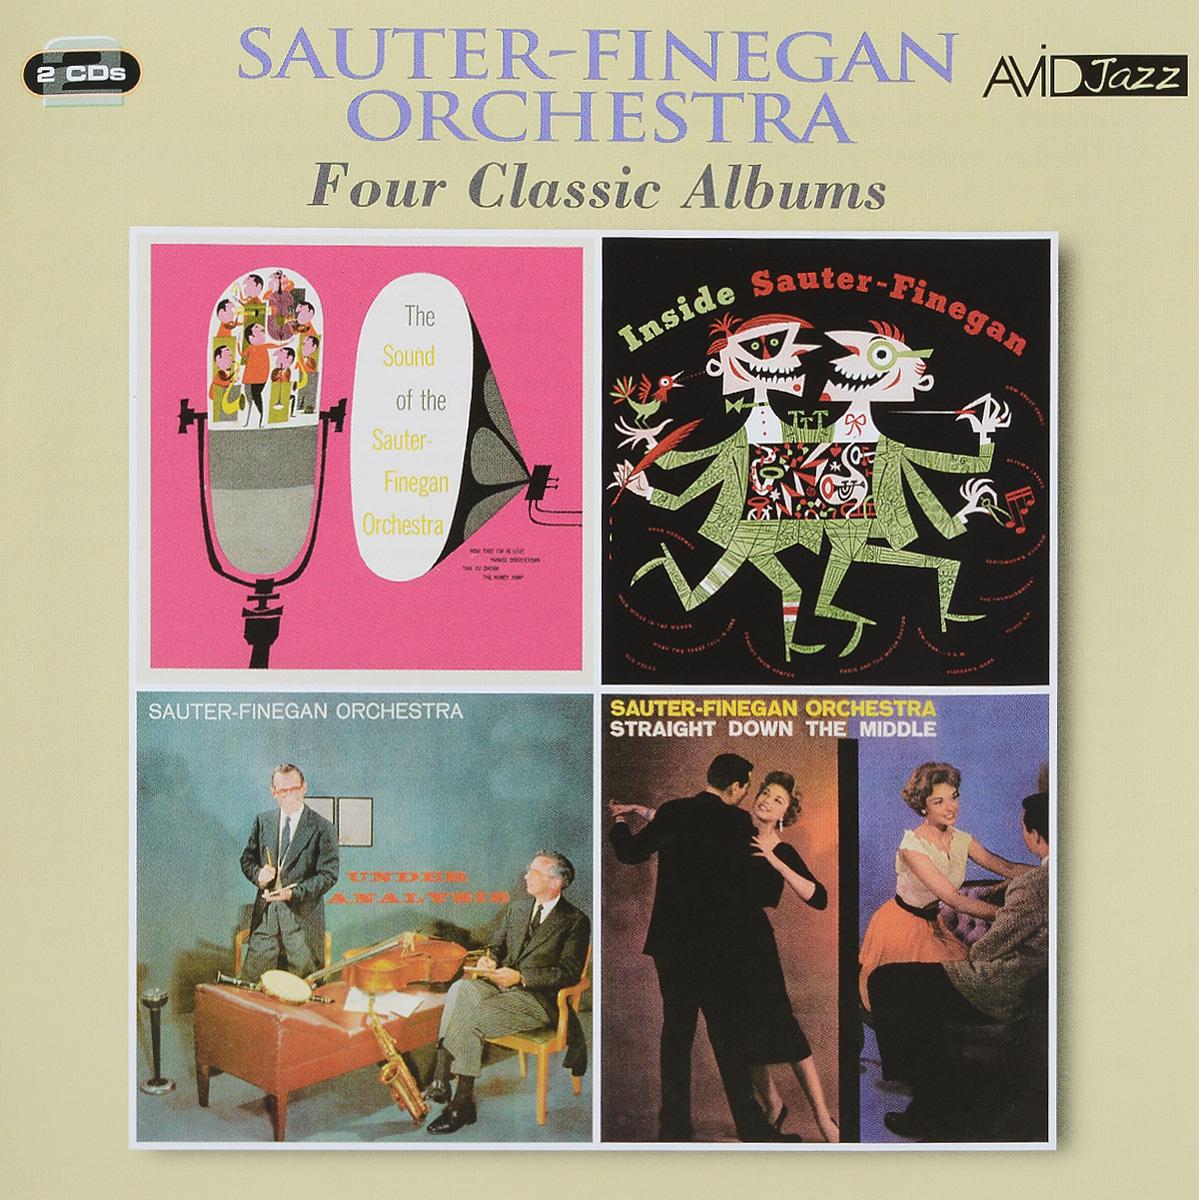 Sauter-Finegan Orchestra,Eddie Sauter,Bill Finegan Avid Jazz. Sauter-Finegan Orchestra. Four Classic Albums (2 CD) avid digidesign machine control win